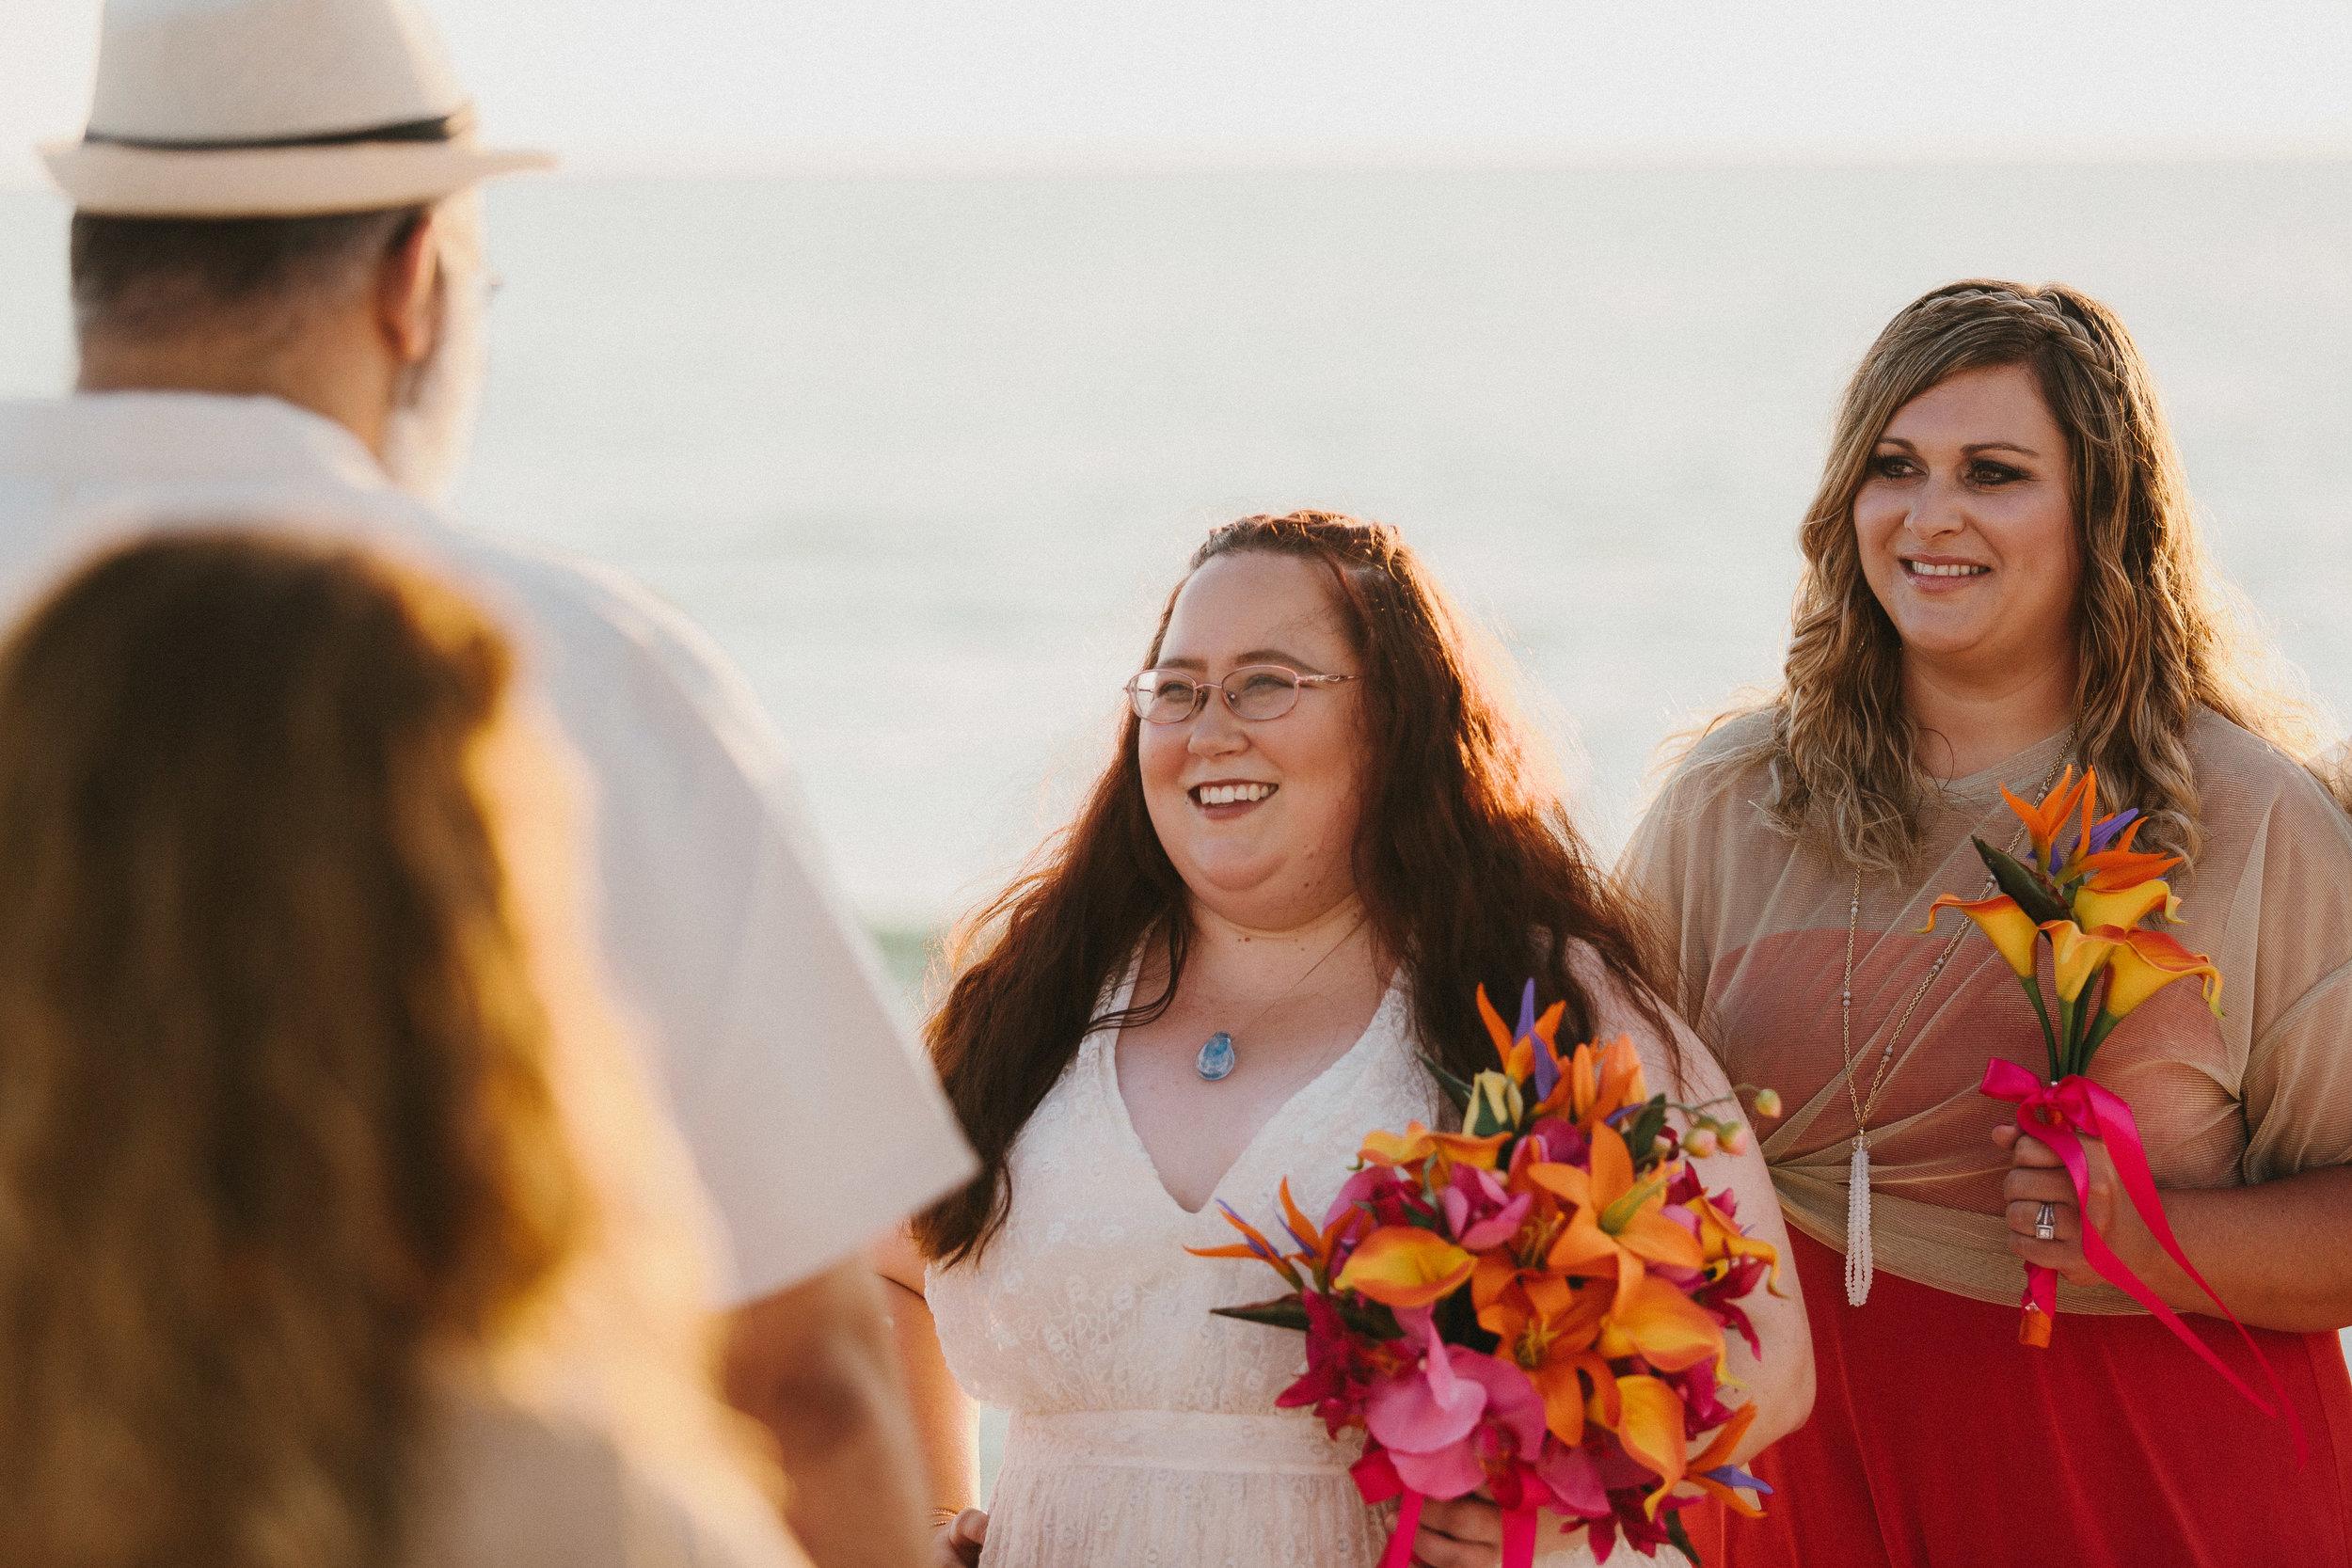 destin_sunset_beach_elopement_intimate_wedding_photographer_florida_documentary_1179.jpg